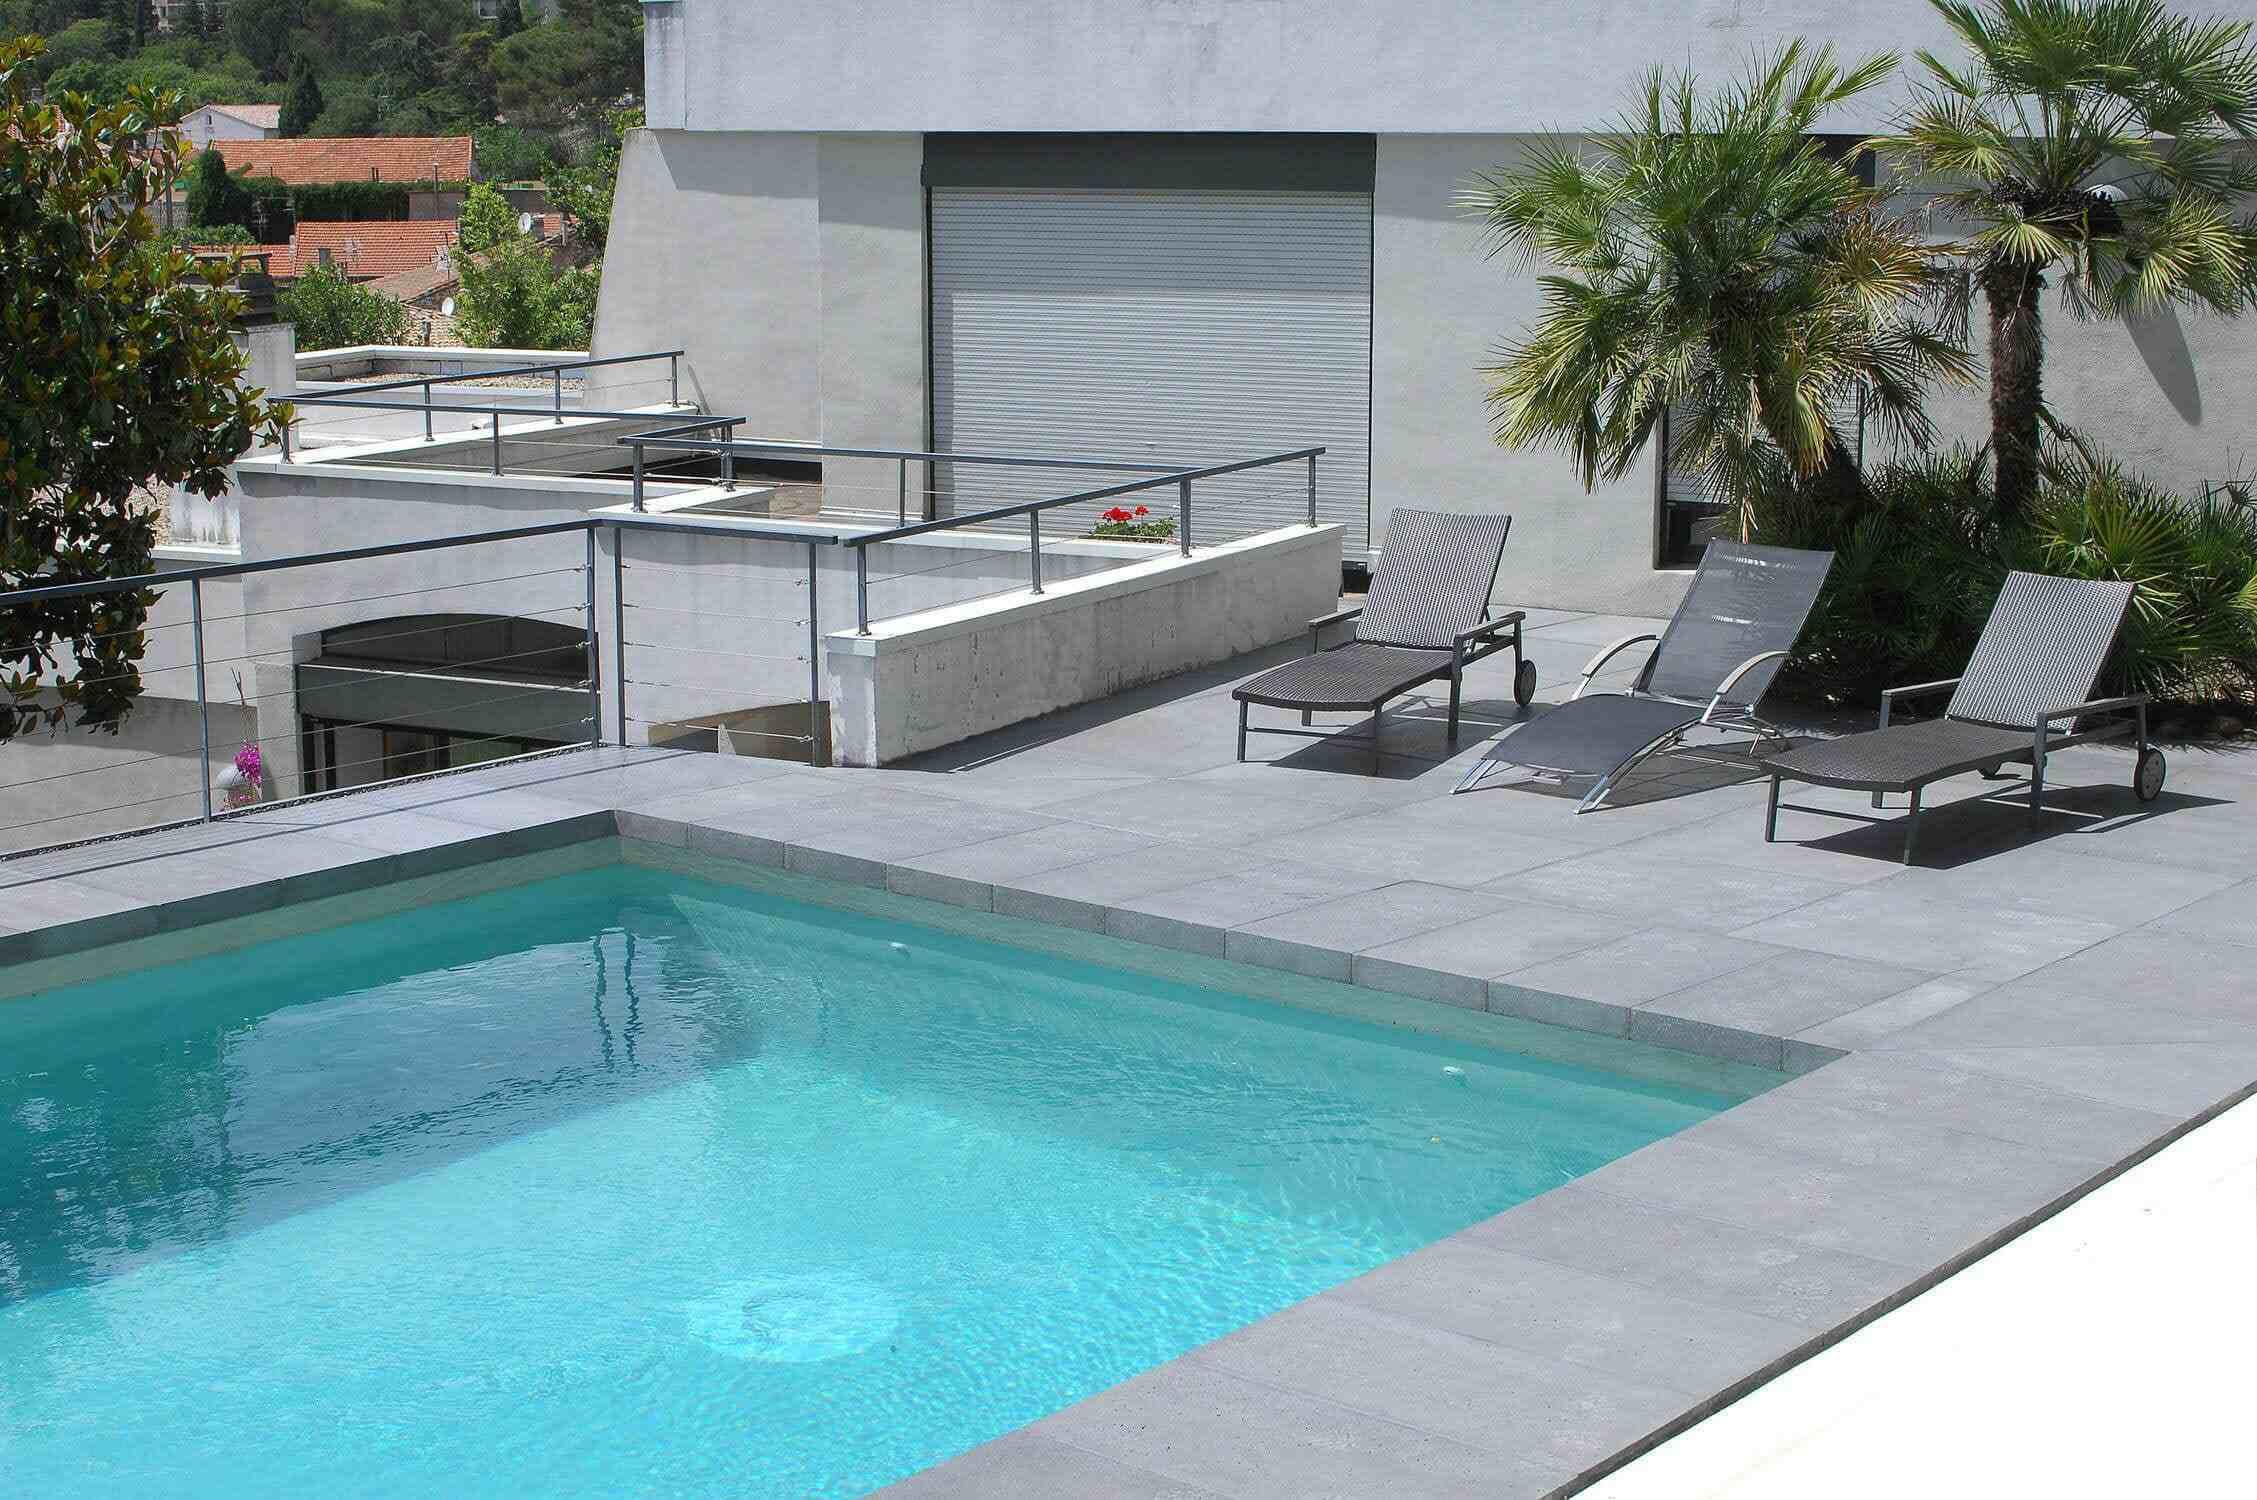 Bluestone Pool Coping Tiles - POOL COPING TILES - NON SLIP ...